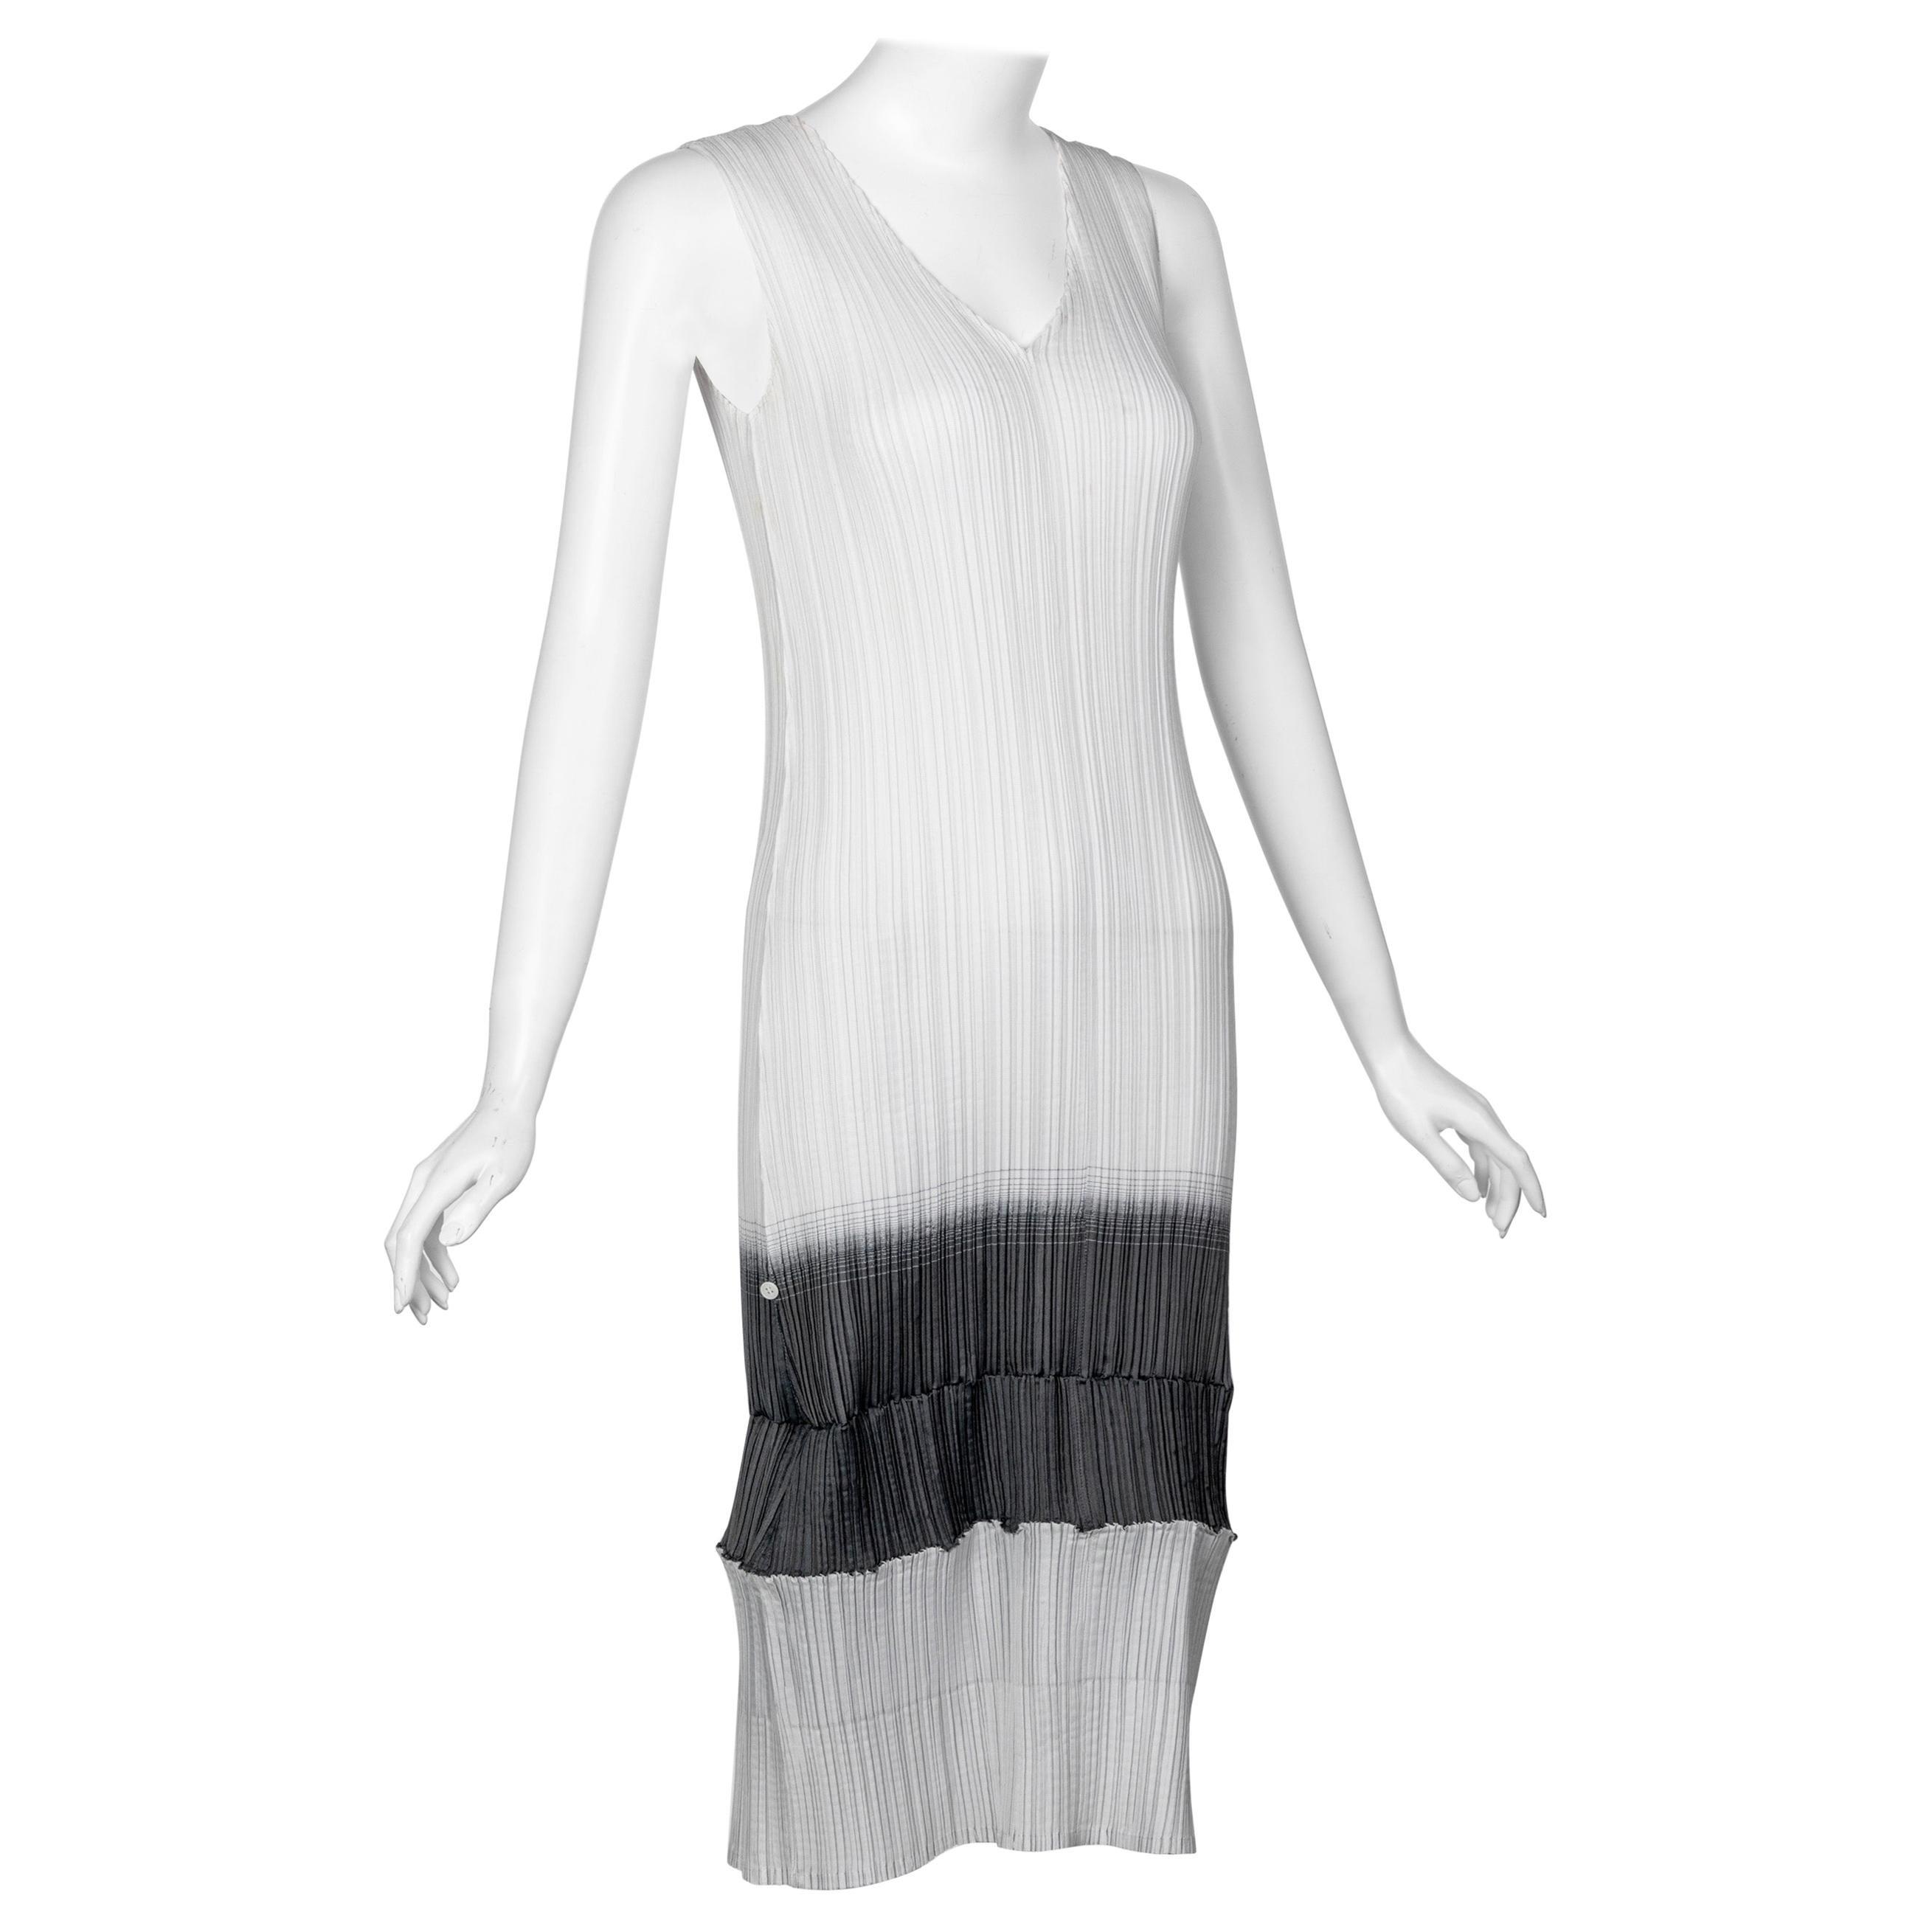 "Issey Miyake ""A Piece of Cloth"" 2-Way White Gray Sleeveless Sculptural Dress"